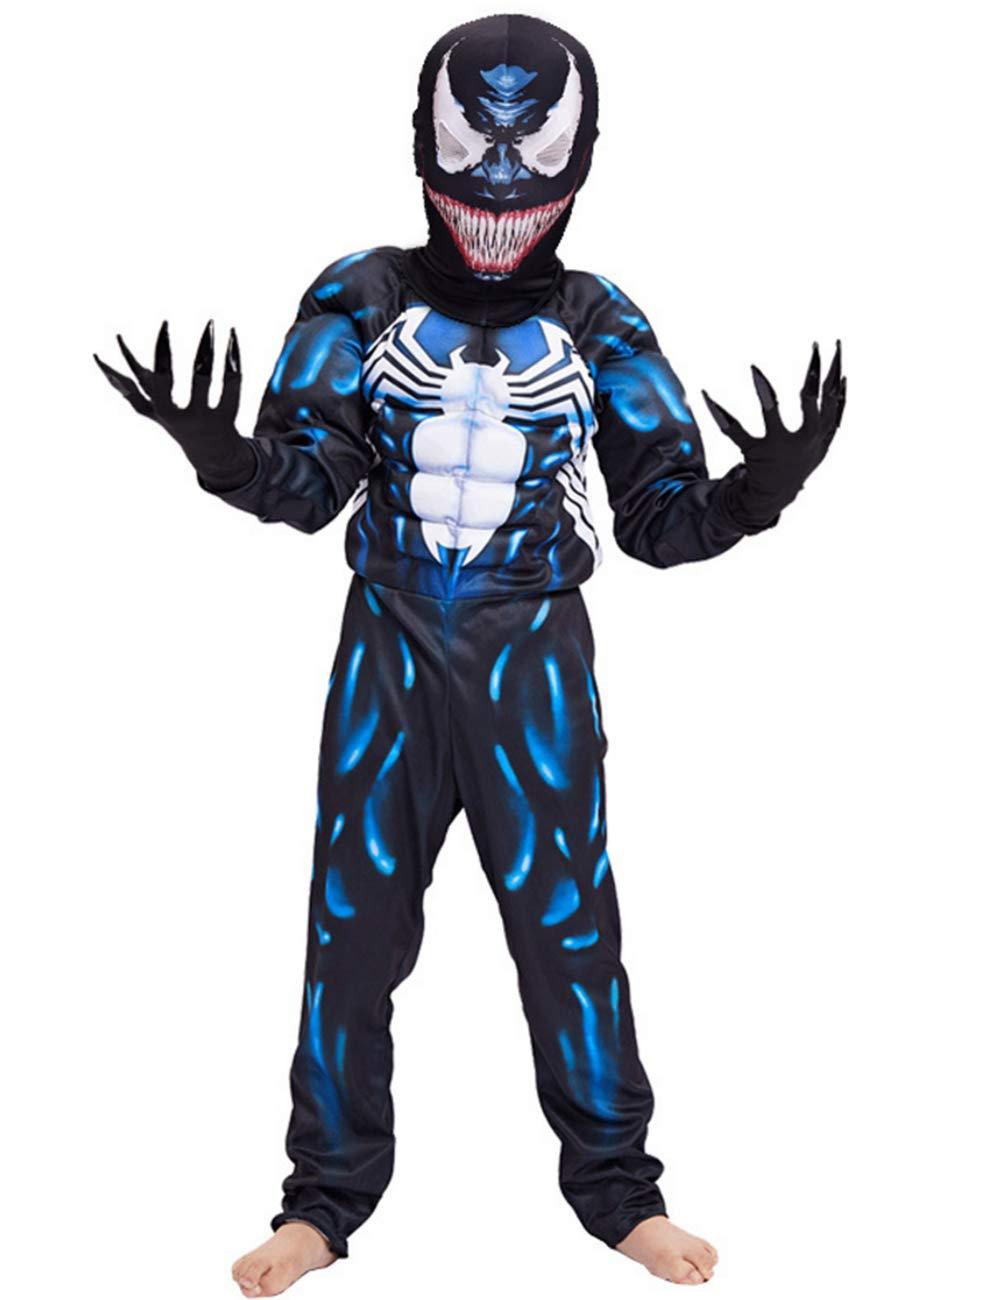 Kids Superhero Costume Suit 3D Spandex Unisex Jumpsuit Bodysuit for Kids Aged 5-13 (Venom, S for Height 43.3''-49.2''(Aged 5-7))